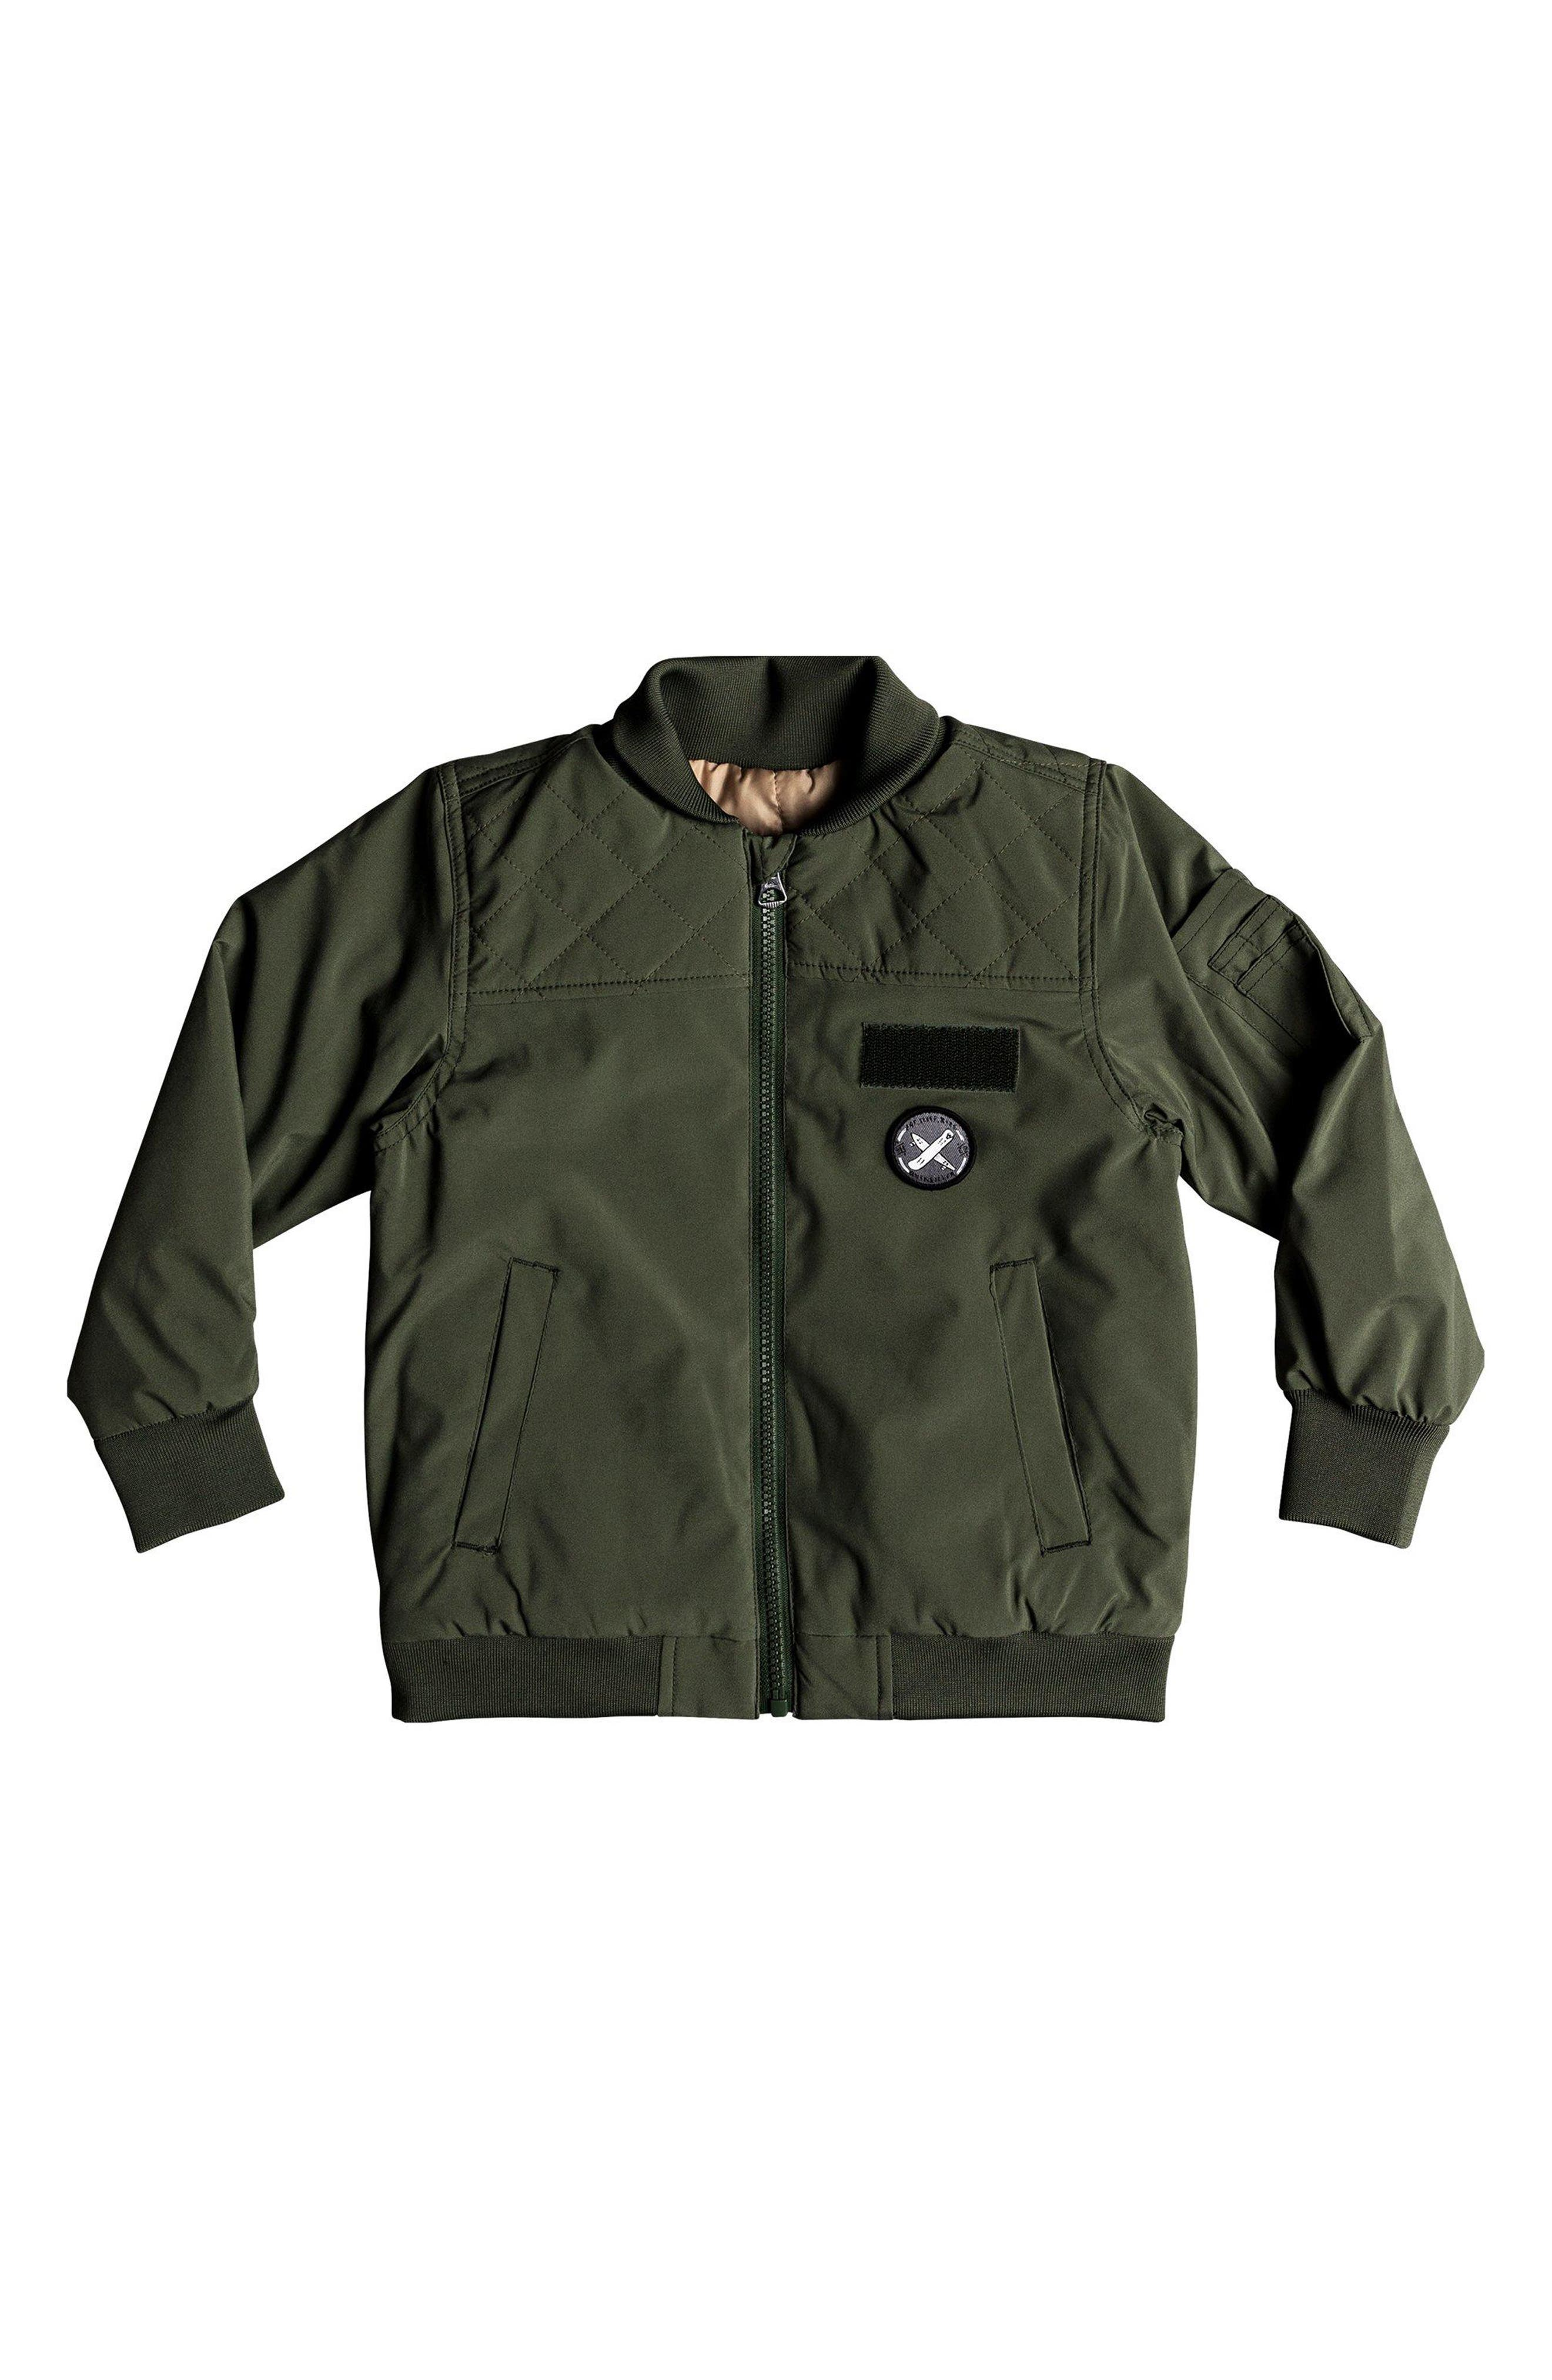 Mankai Sun Bomber Jacket,                         Main,                         color, THYME